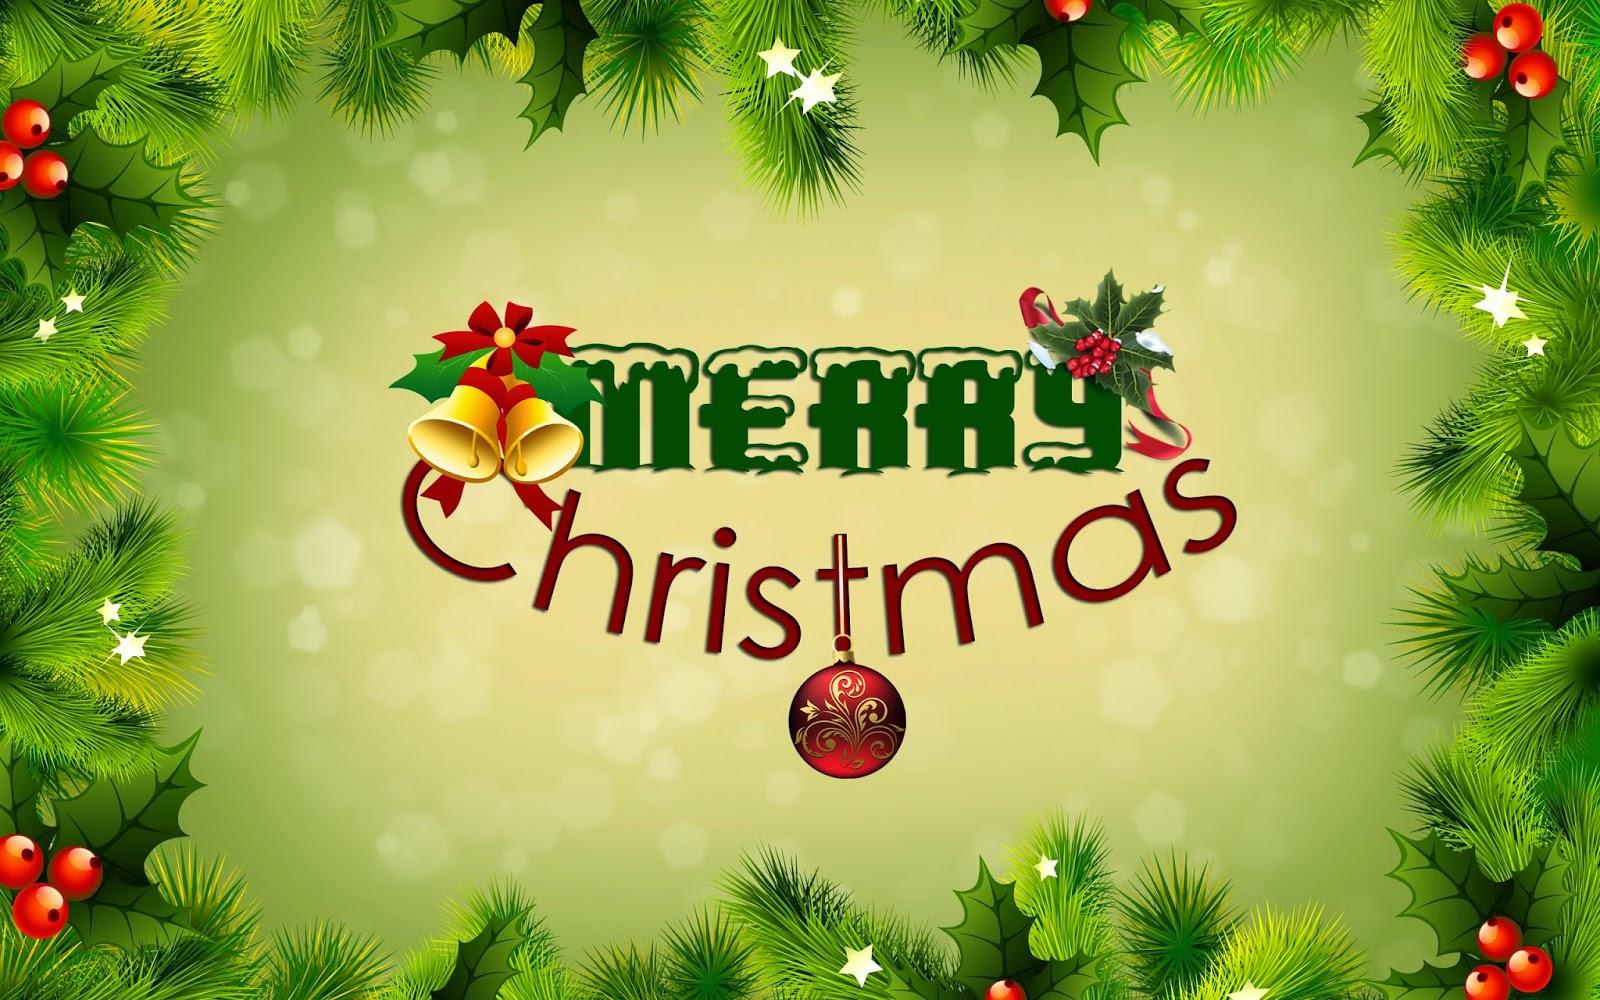 merry christmas full hd wallpaper download